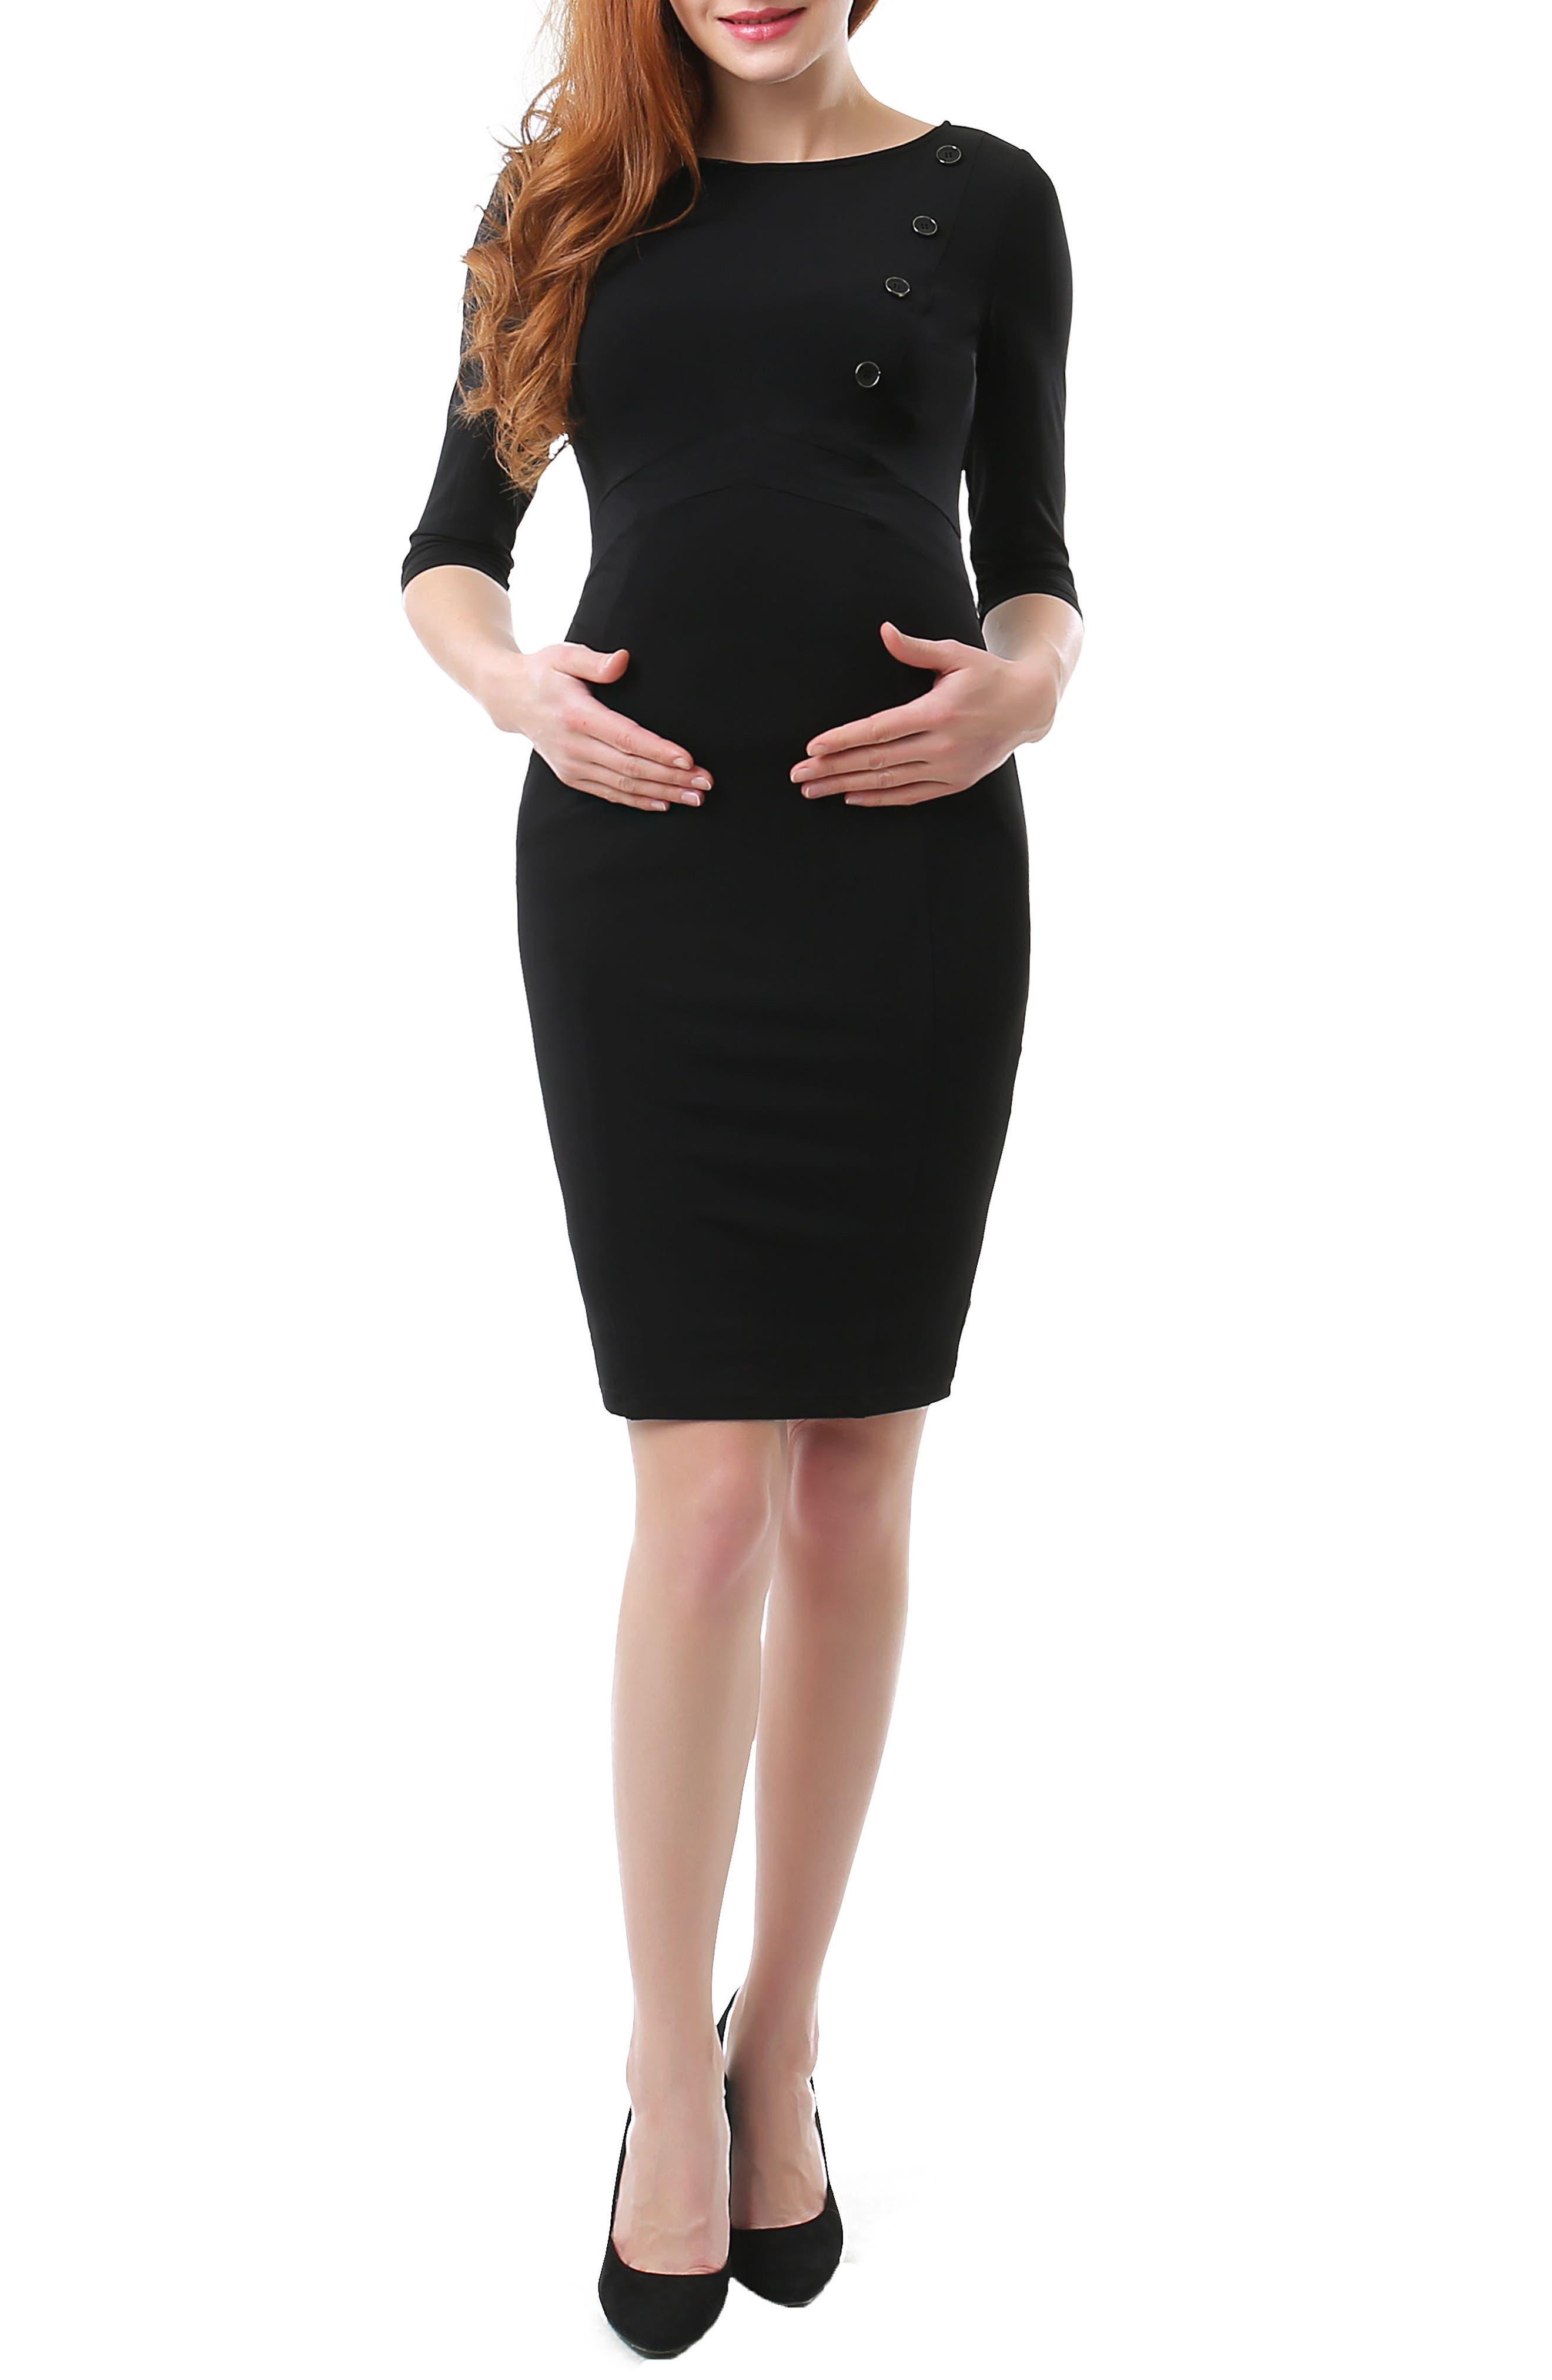 Main Image - Kimi and Kai Meredith Maternity Dress